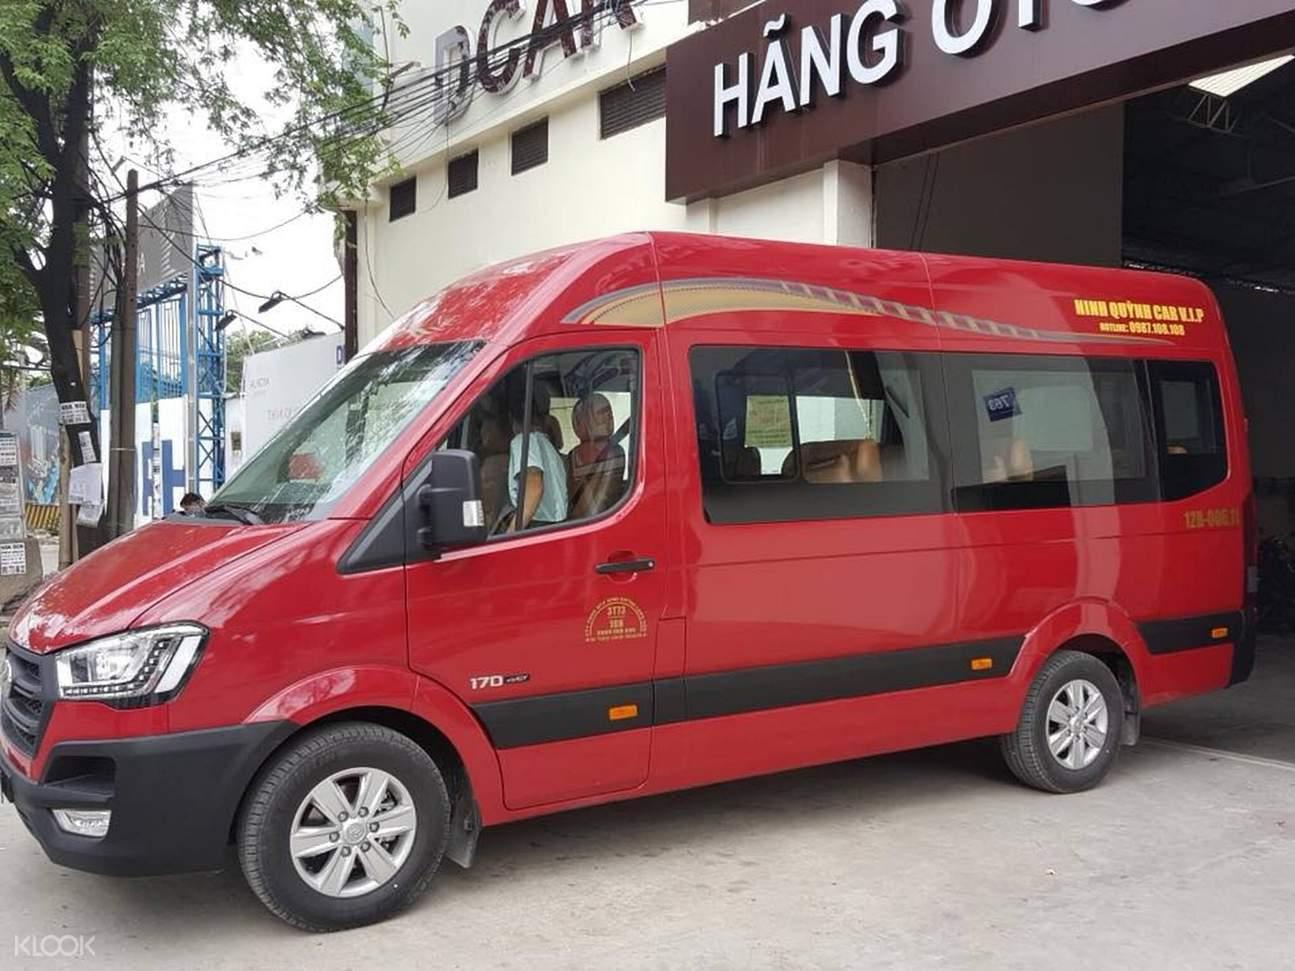 red limousine in vietnam